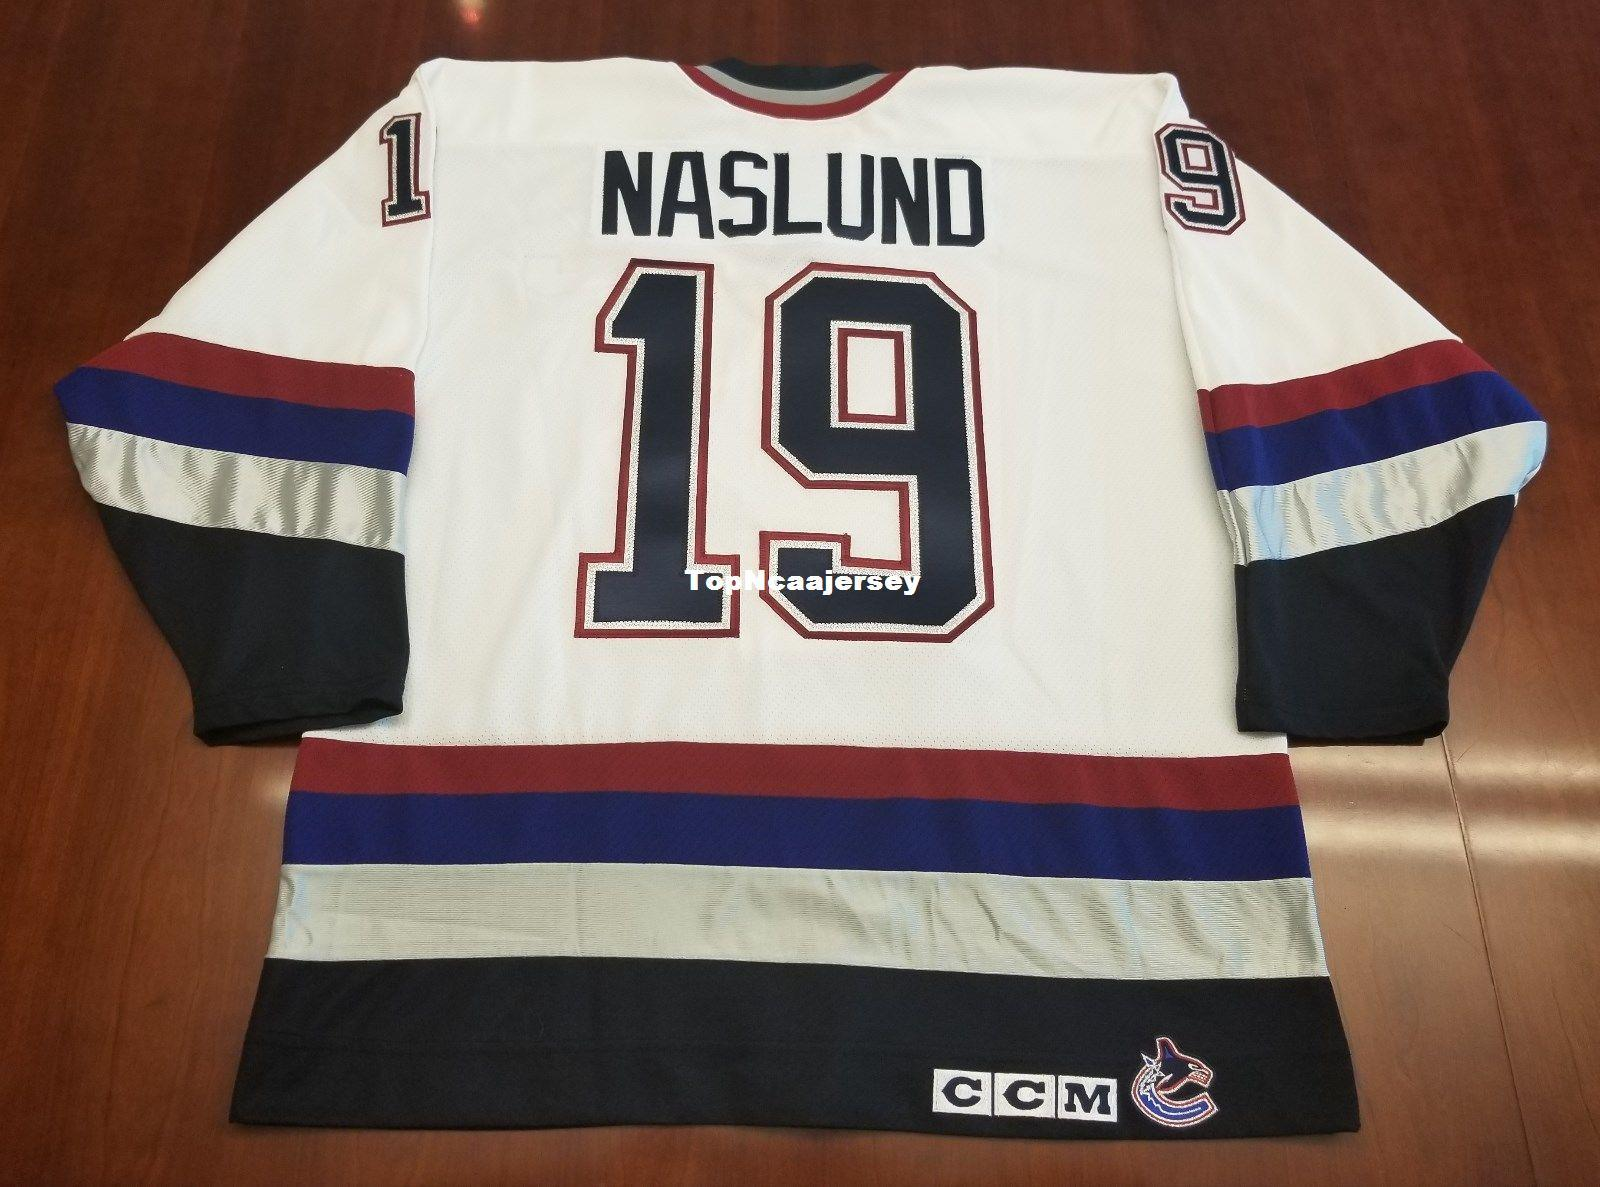 e110bcbe2 2019 Wholesale Markus Naslund Vintage Vancouver Canucks CCM Cheap Hockey  Jersey White Mens Retro Jerseys From Topncaajersey